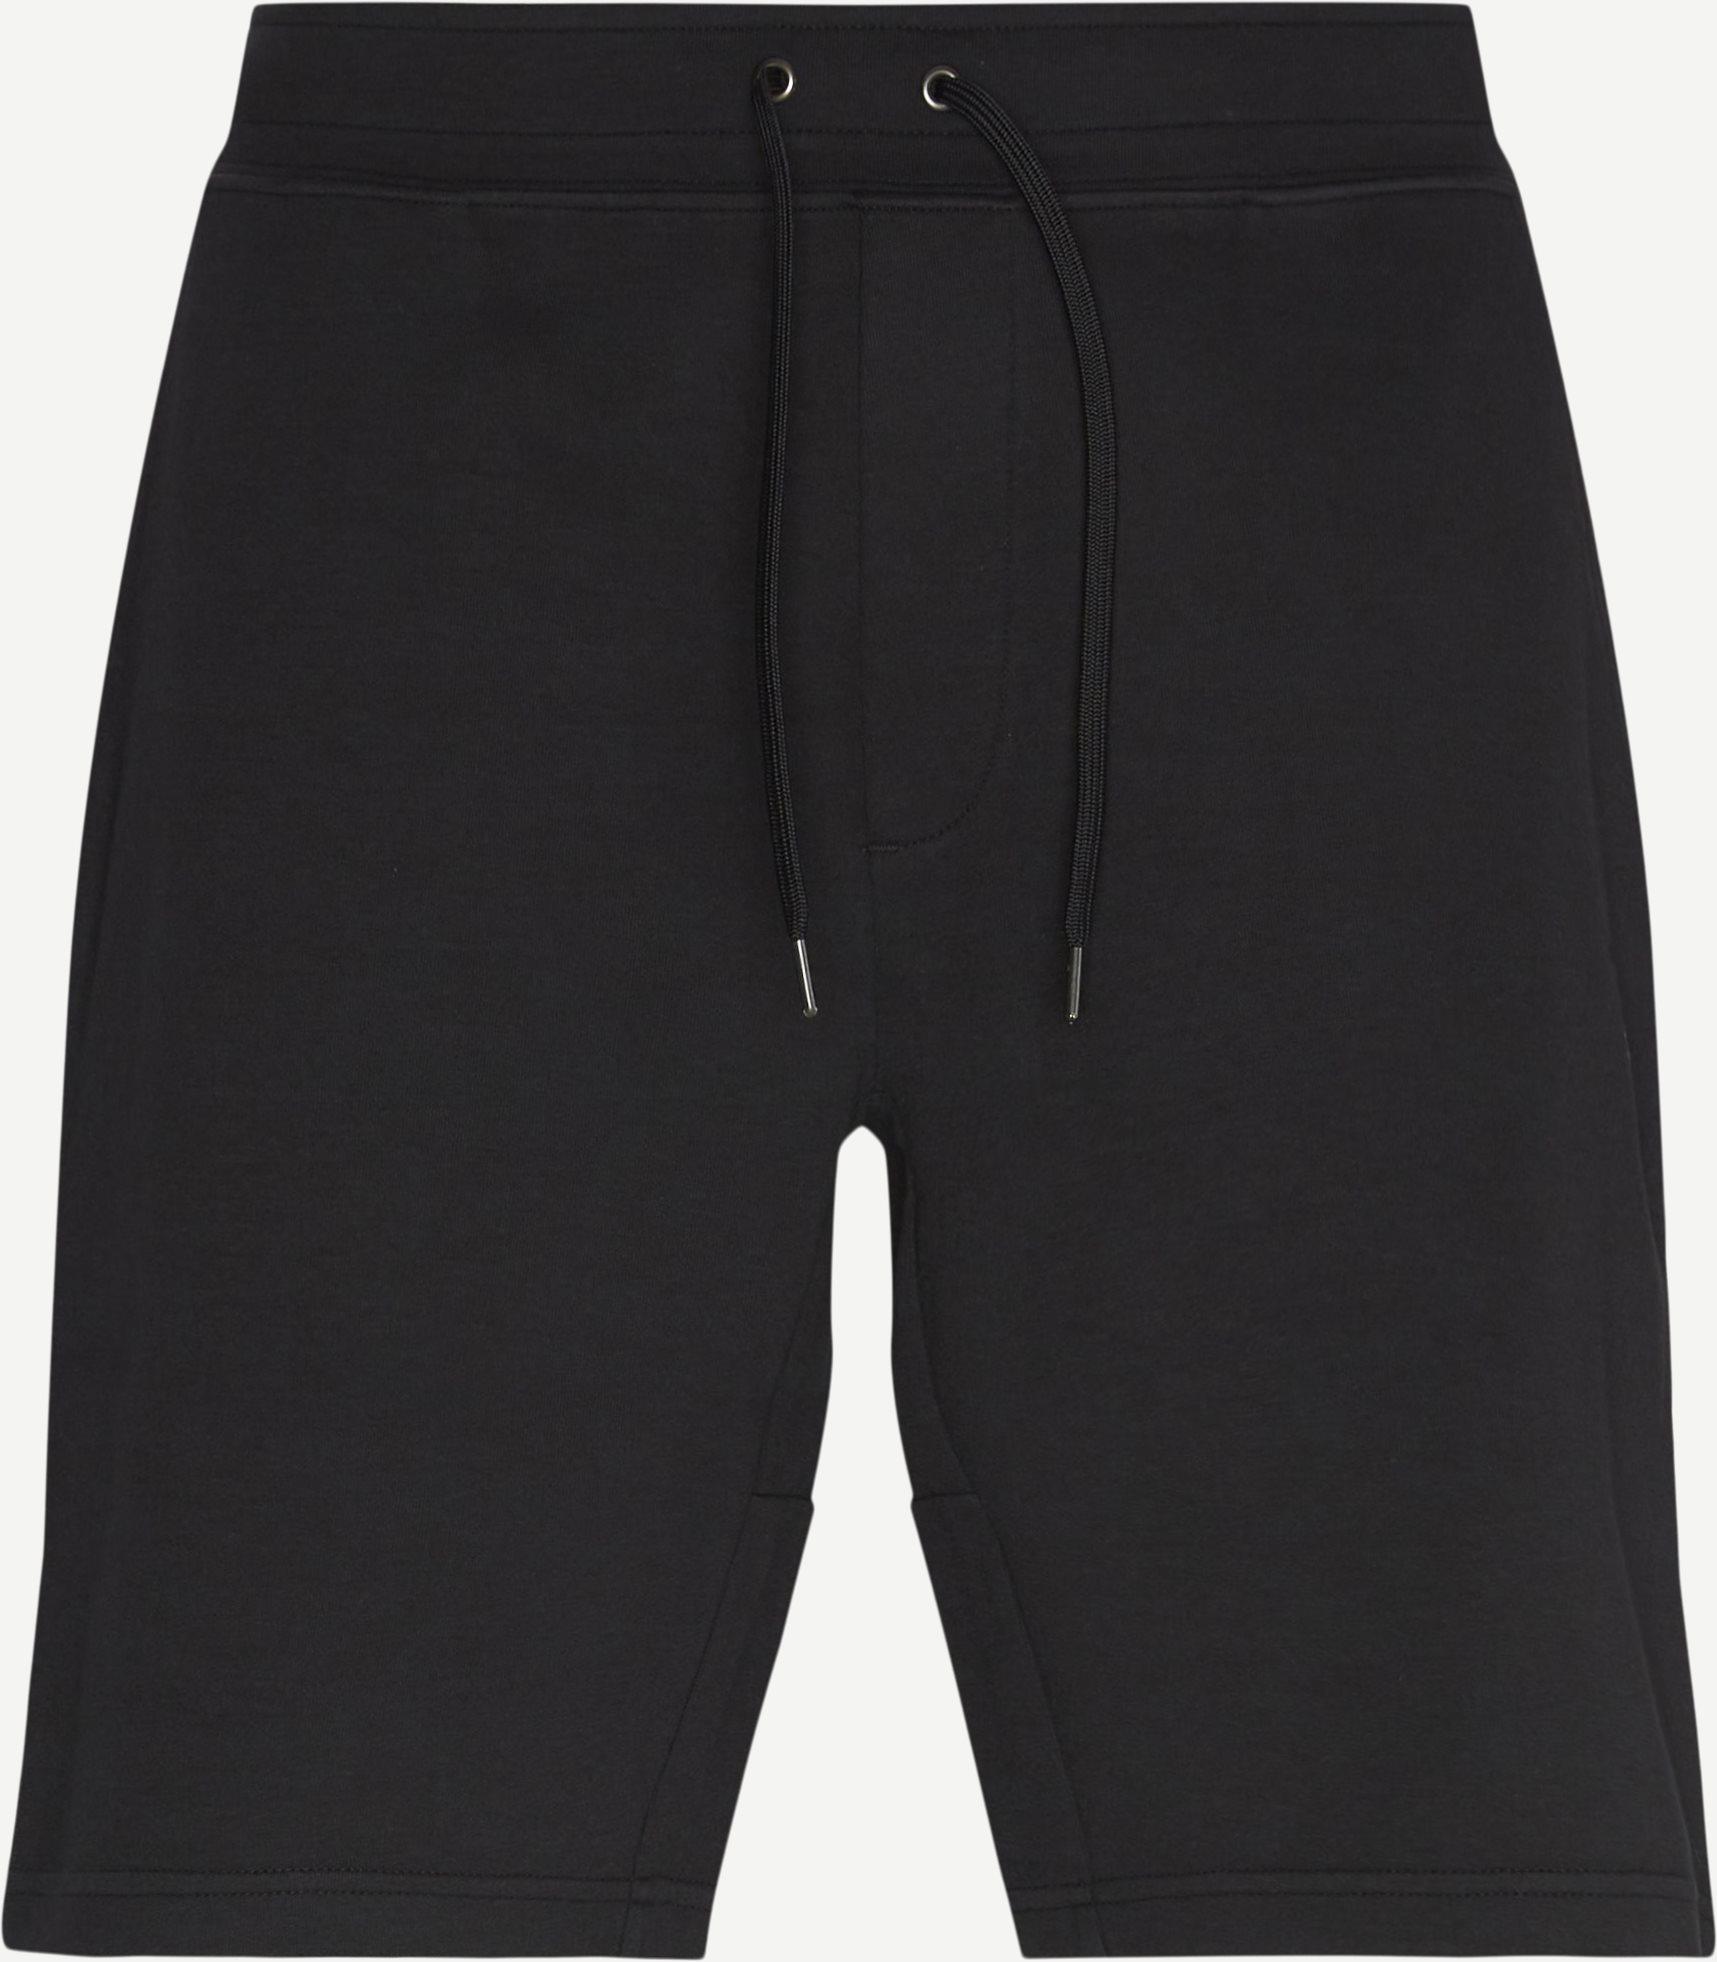 Cotton Shorts - Shorts - Regular fit - Sort